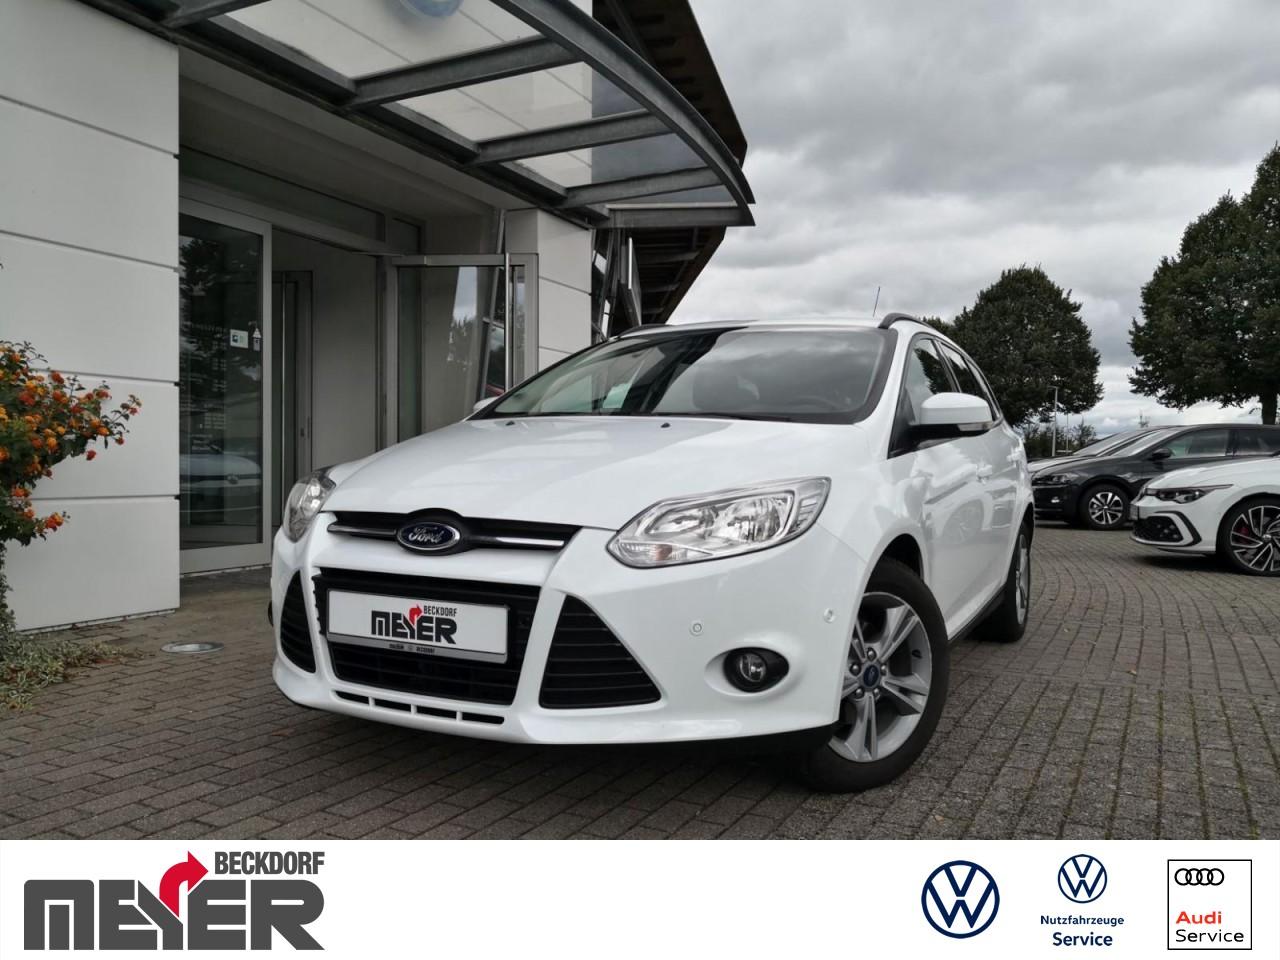 Ford Focus Kombi 1.0 EcoBoost SYNC Edition Klima, Jahr 2014, Benzin